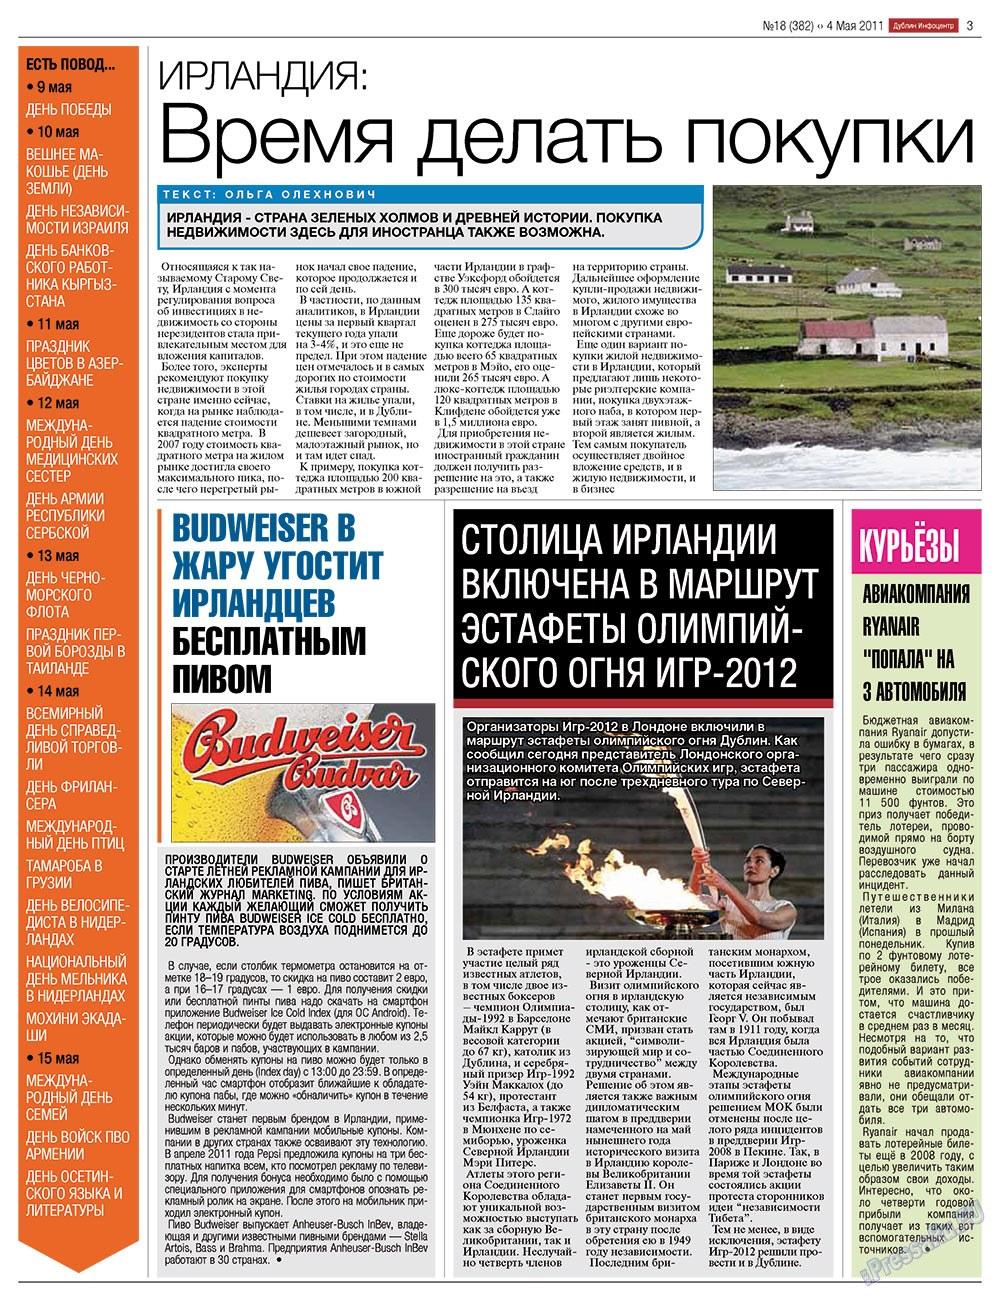 Дублин инфоцентр (газета). 2011 год, номер 18, стр. 3